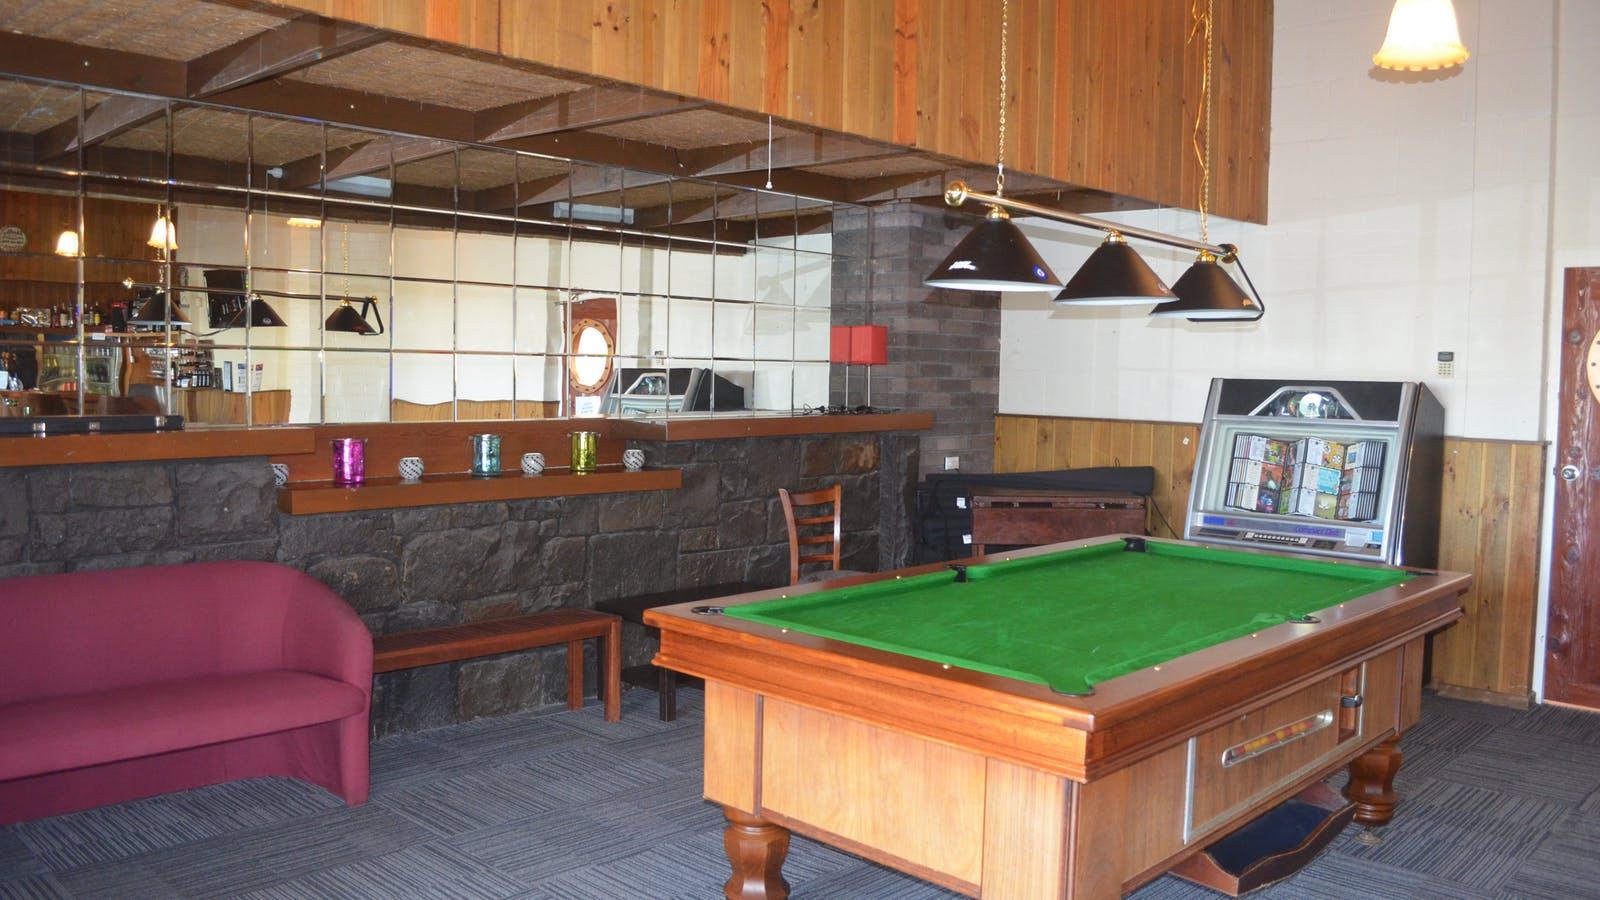 Billiard table and bar